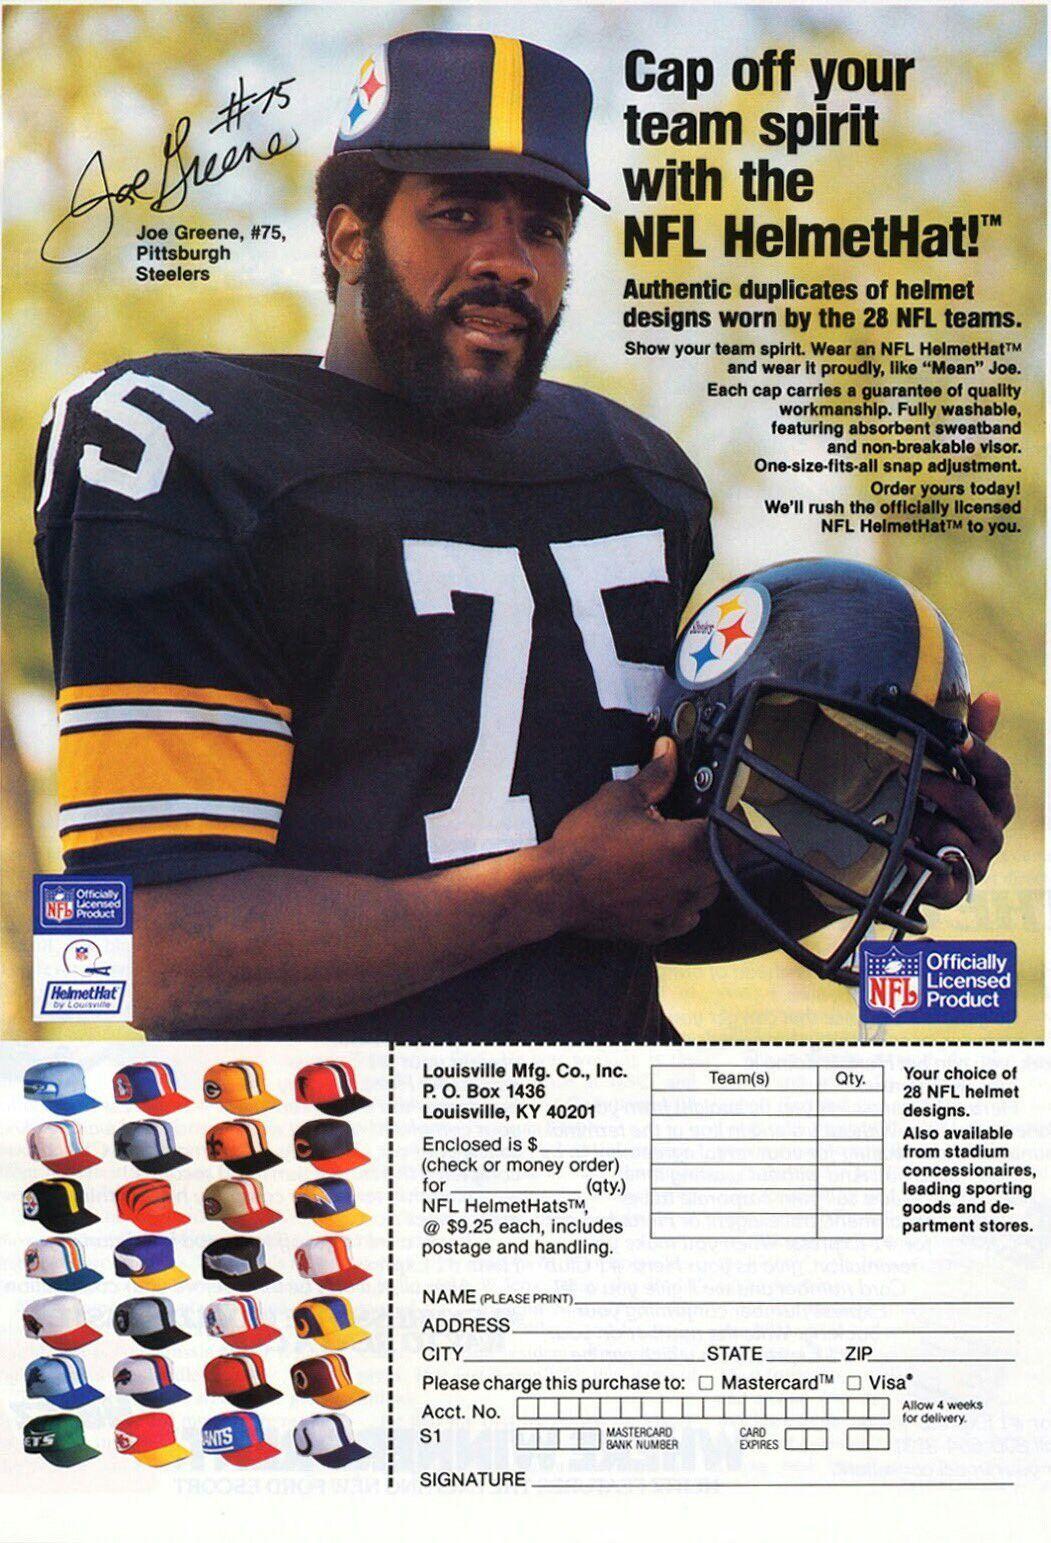 Steelers image by Mike McGuire Joe greene, Pittsburgh